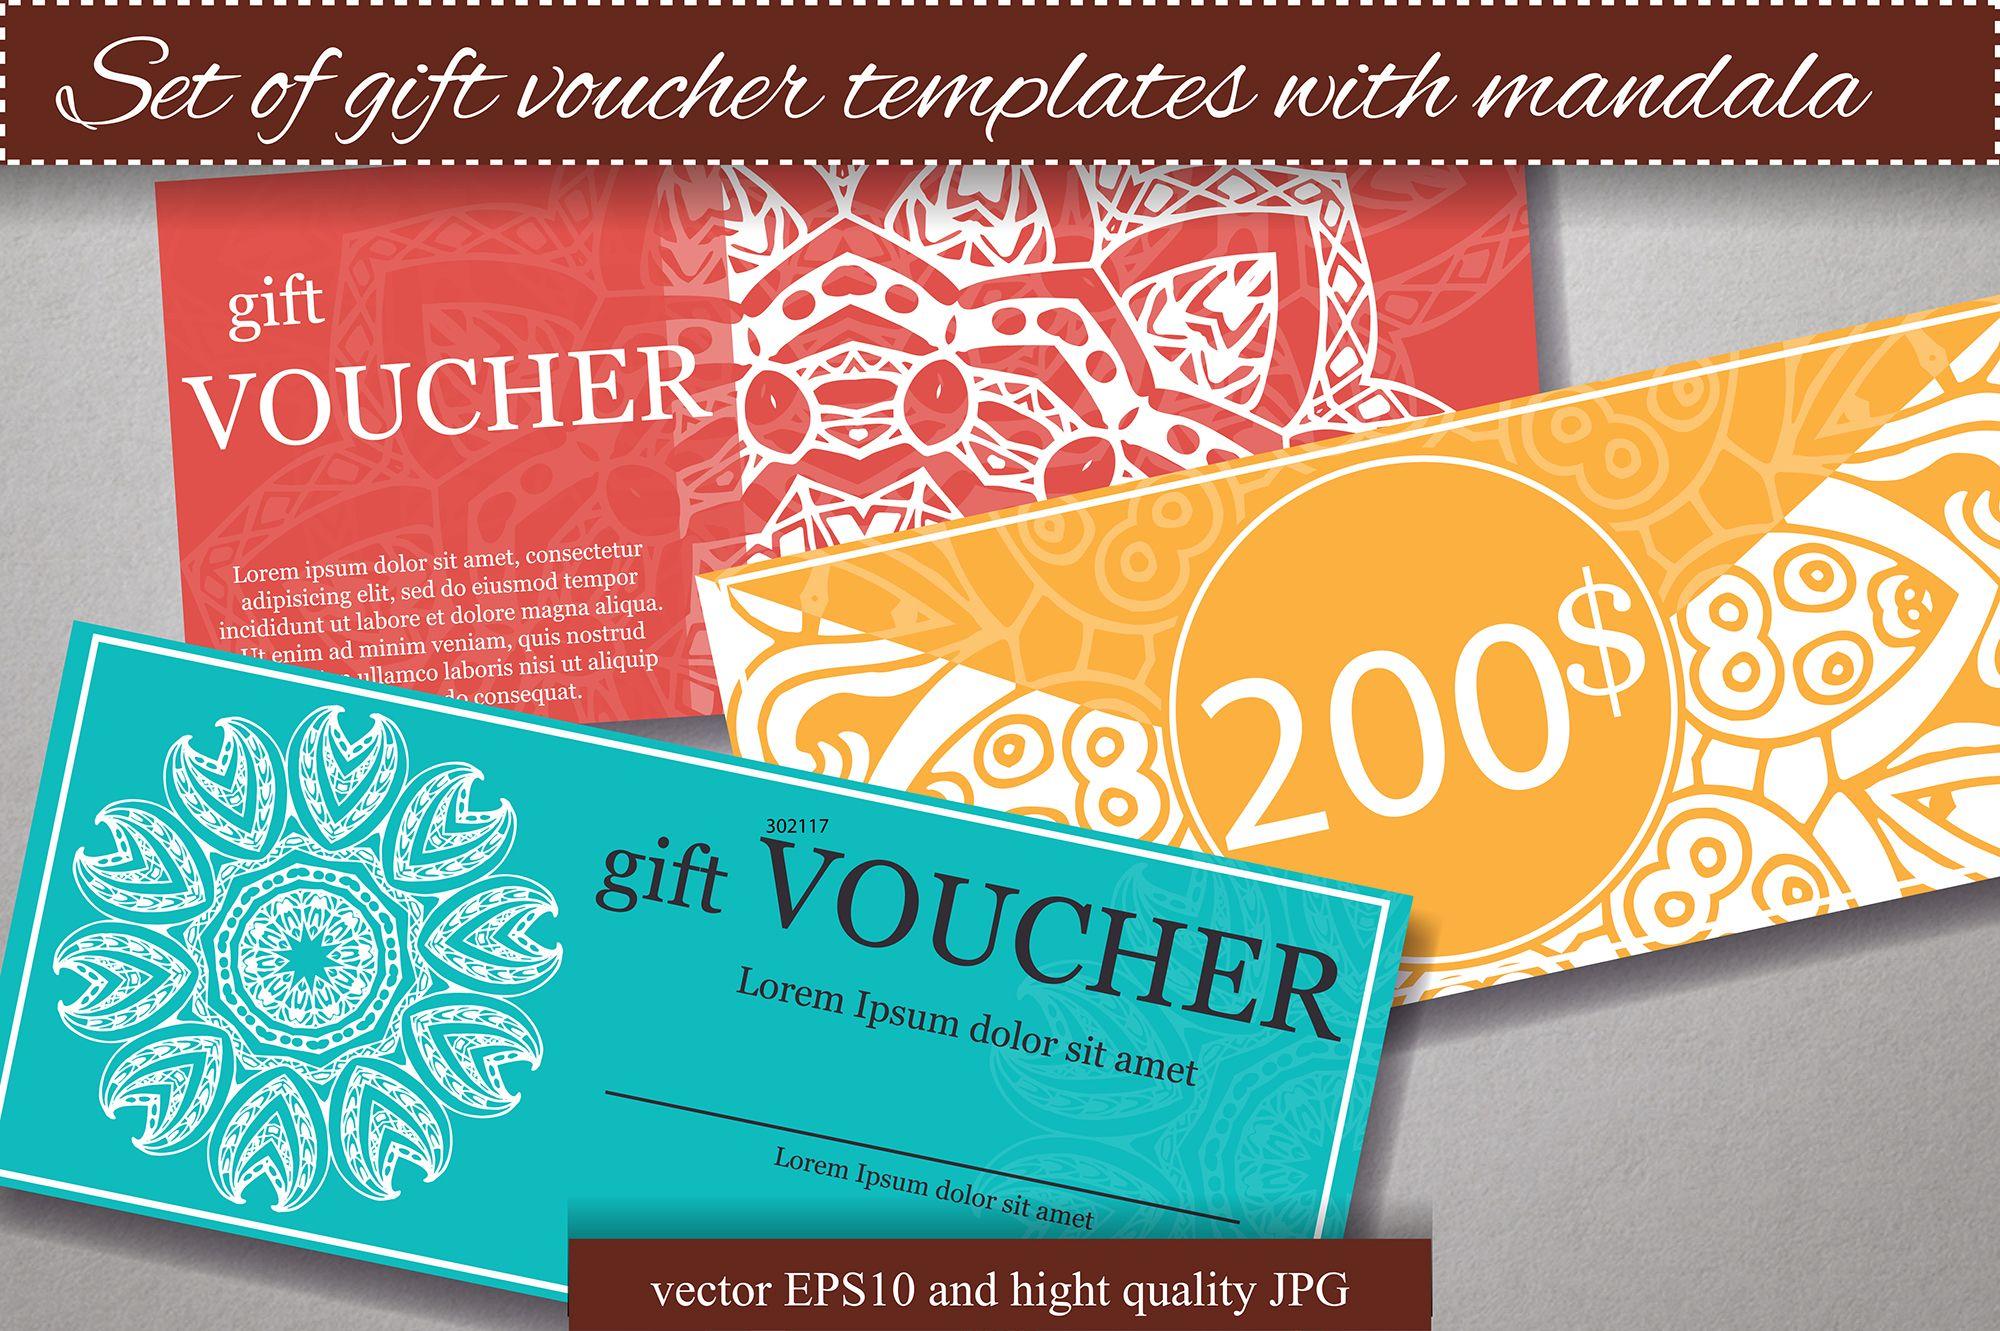 set of gift voucher templates by astartejulia7893 on creative market